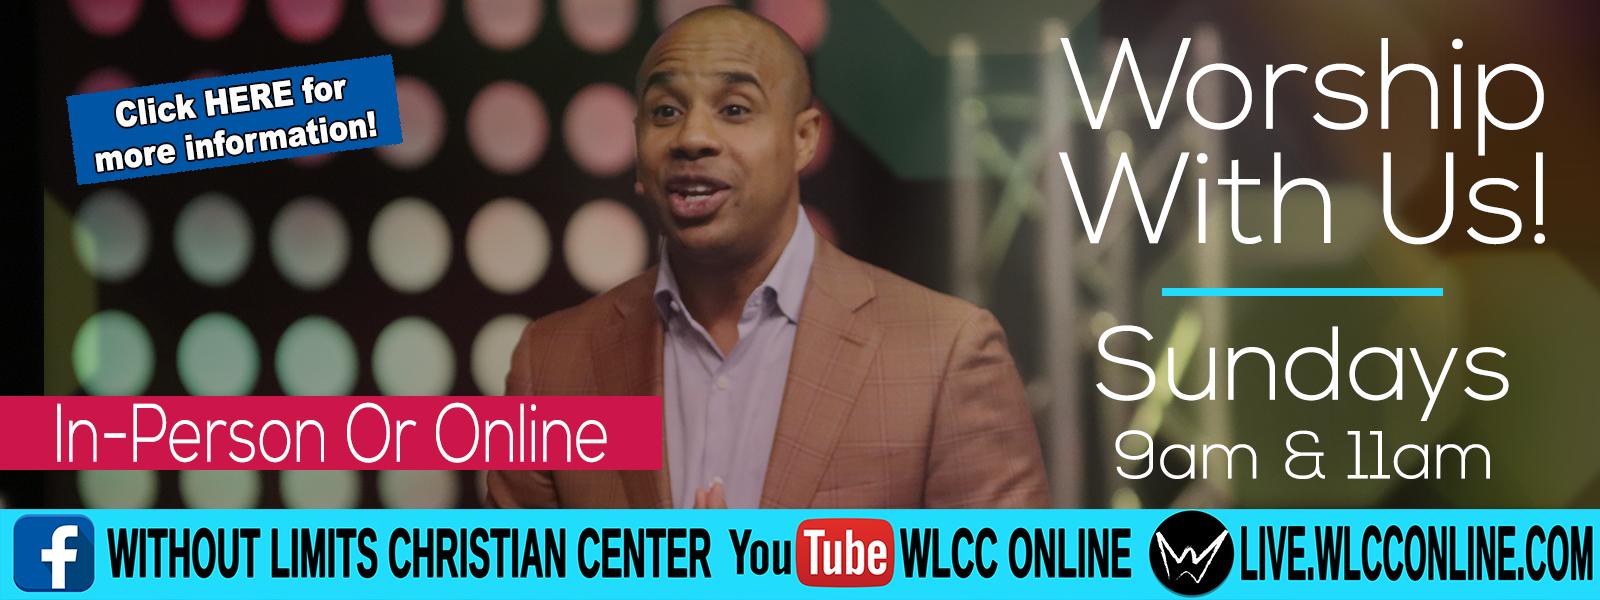 September 2020 Worship With Us Online slide